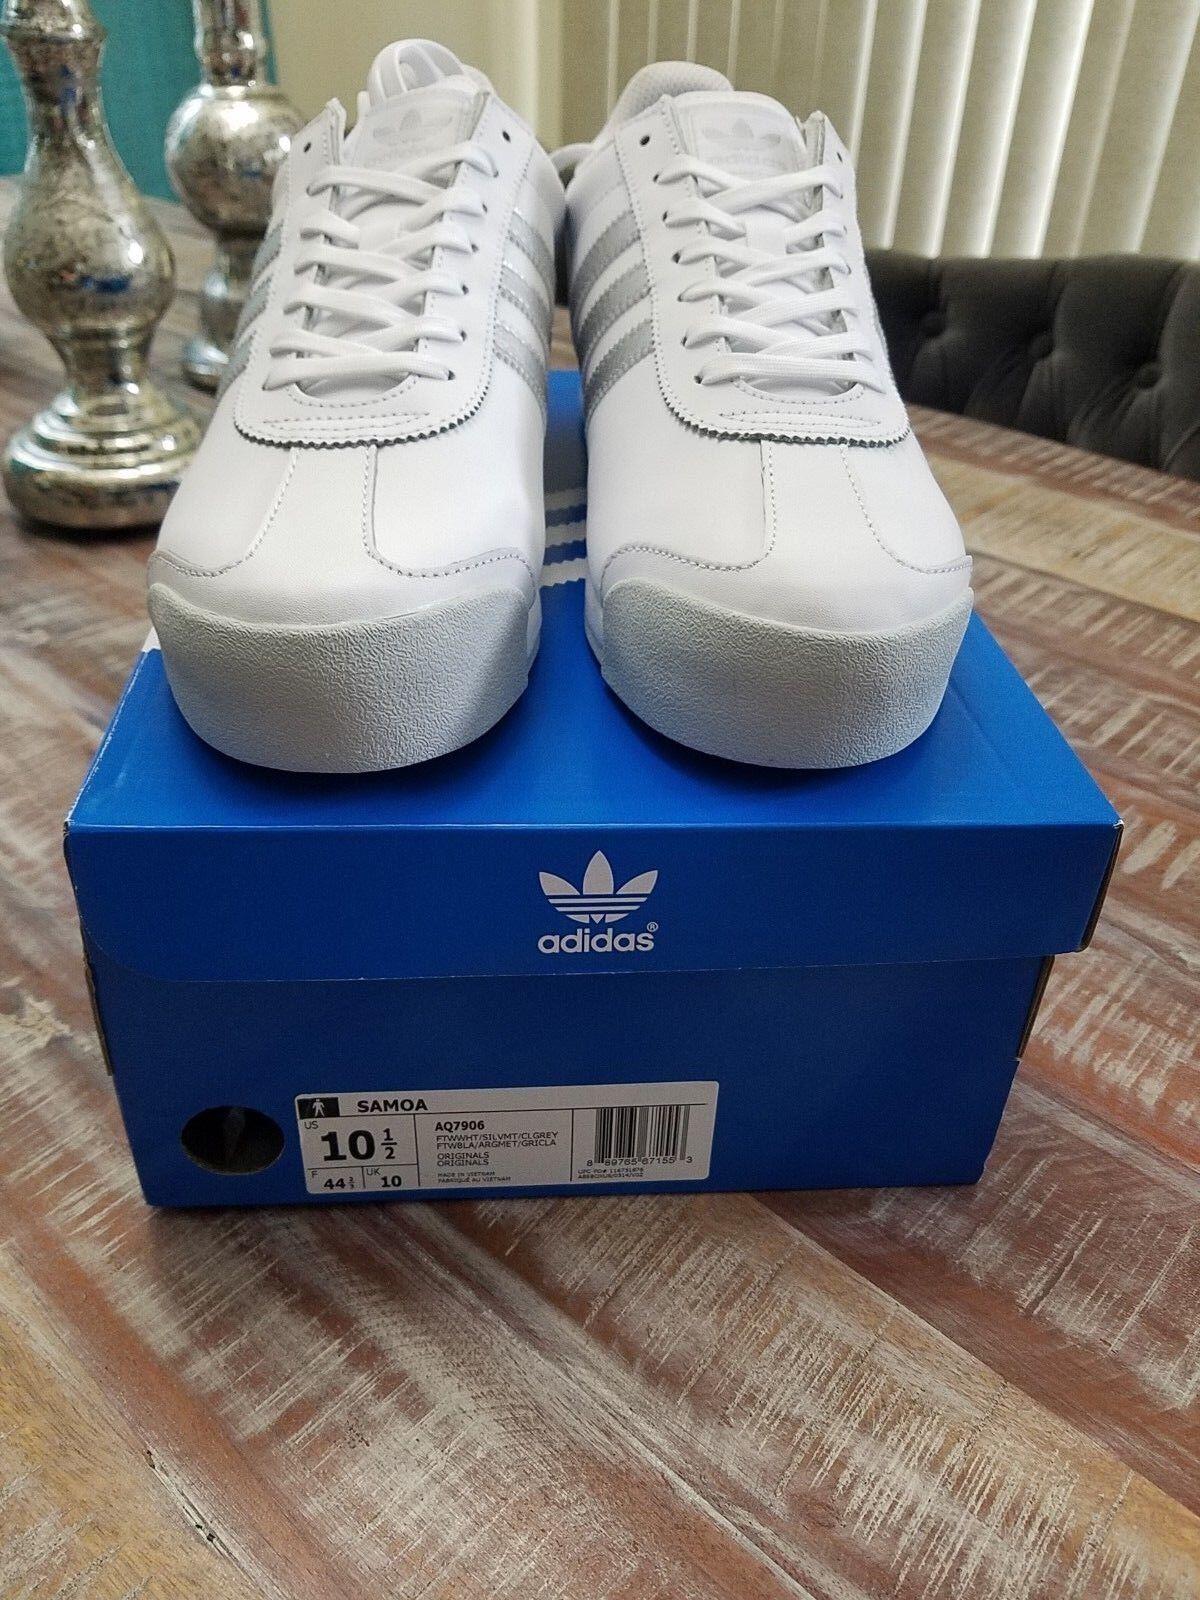 Adidas Samoa Men's Athletic shoes White Silver Grey Size 10.5